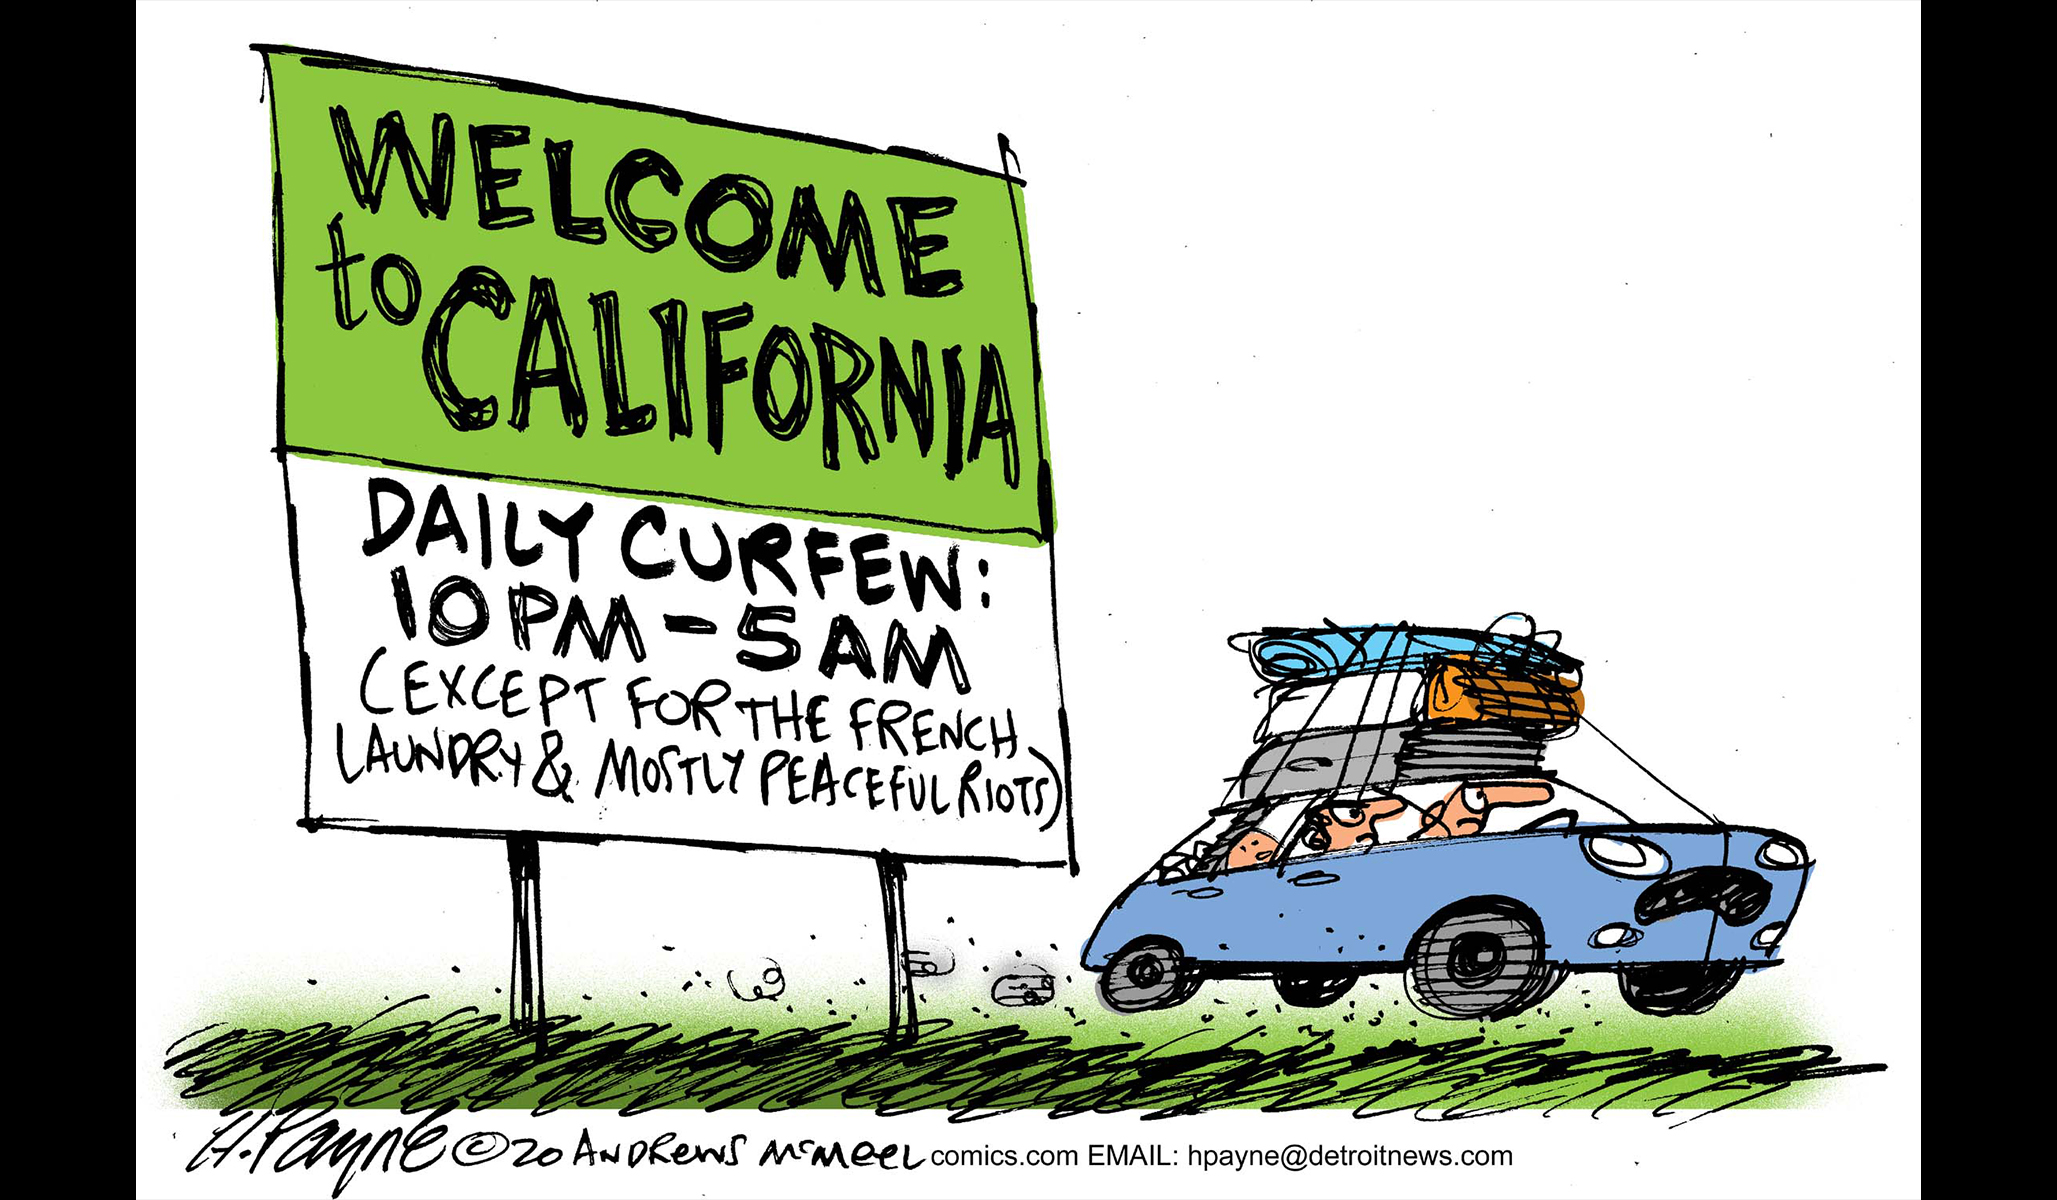 [Image: CaliforniaCOVIDCurfew.jpg]